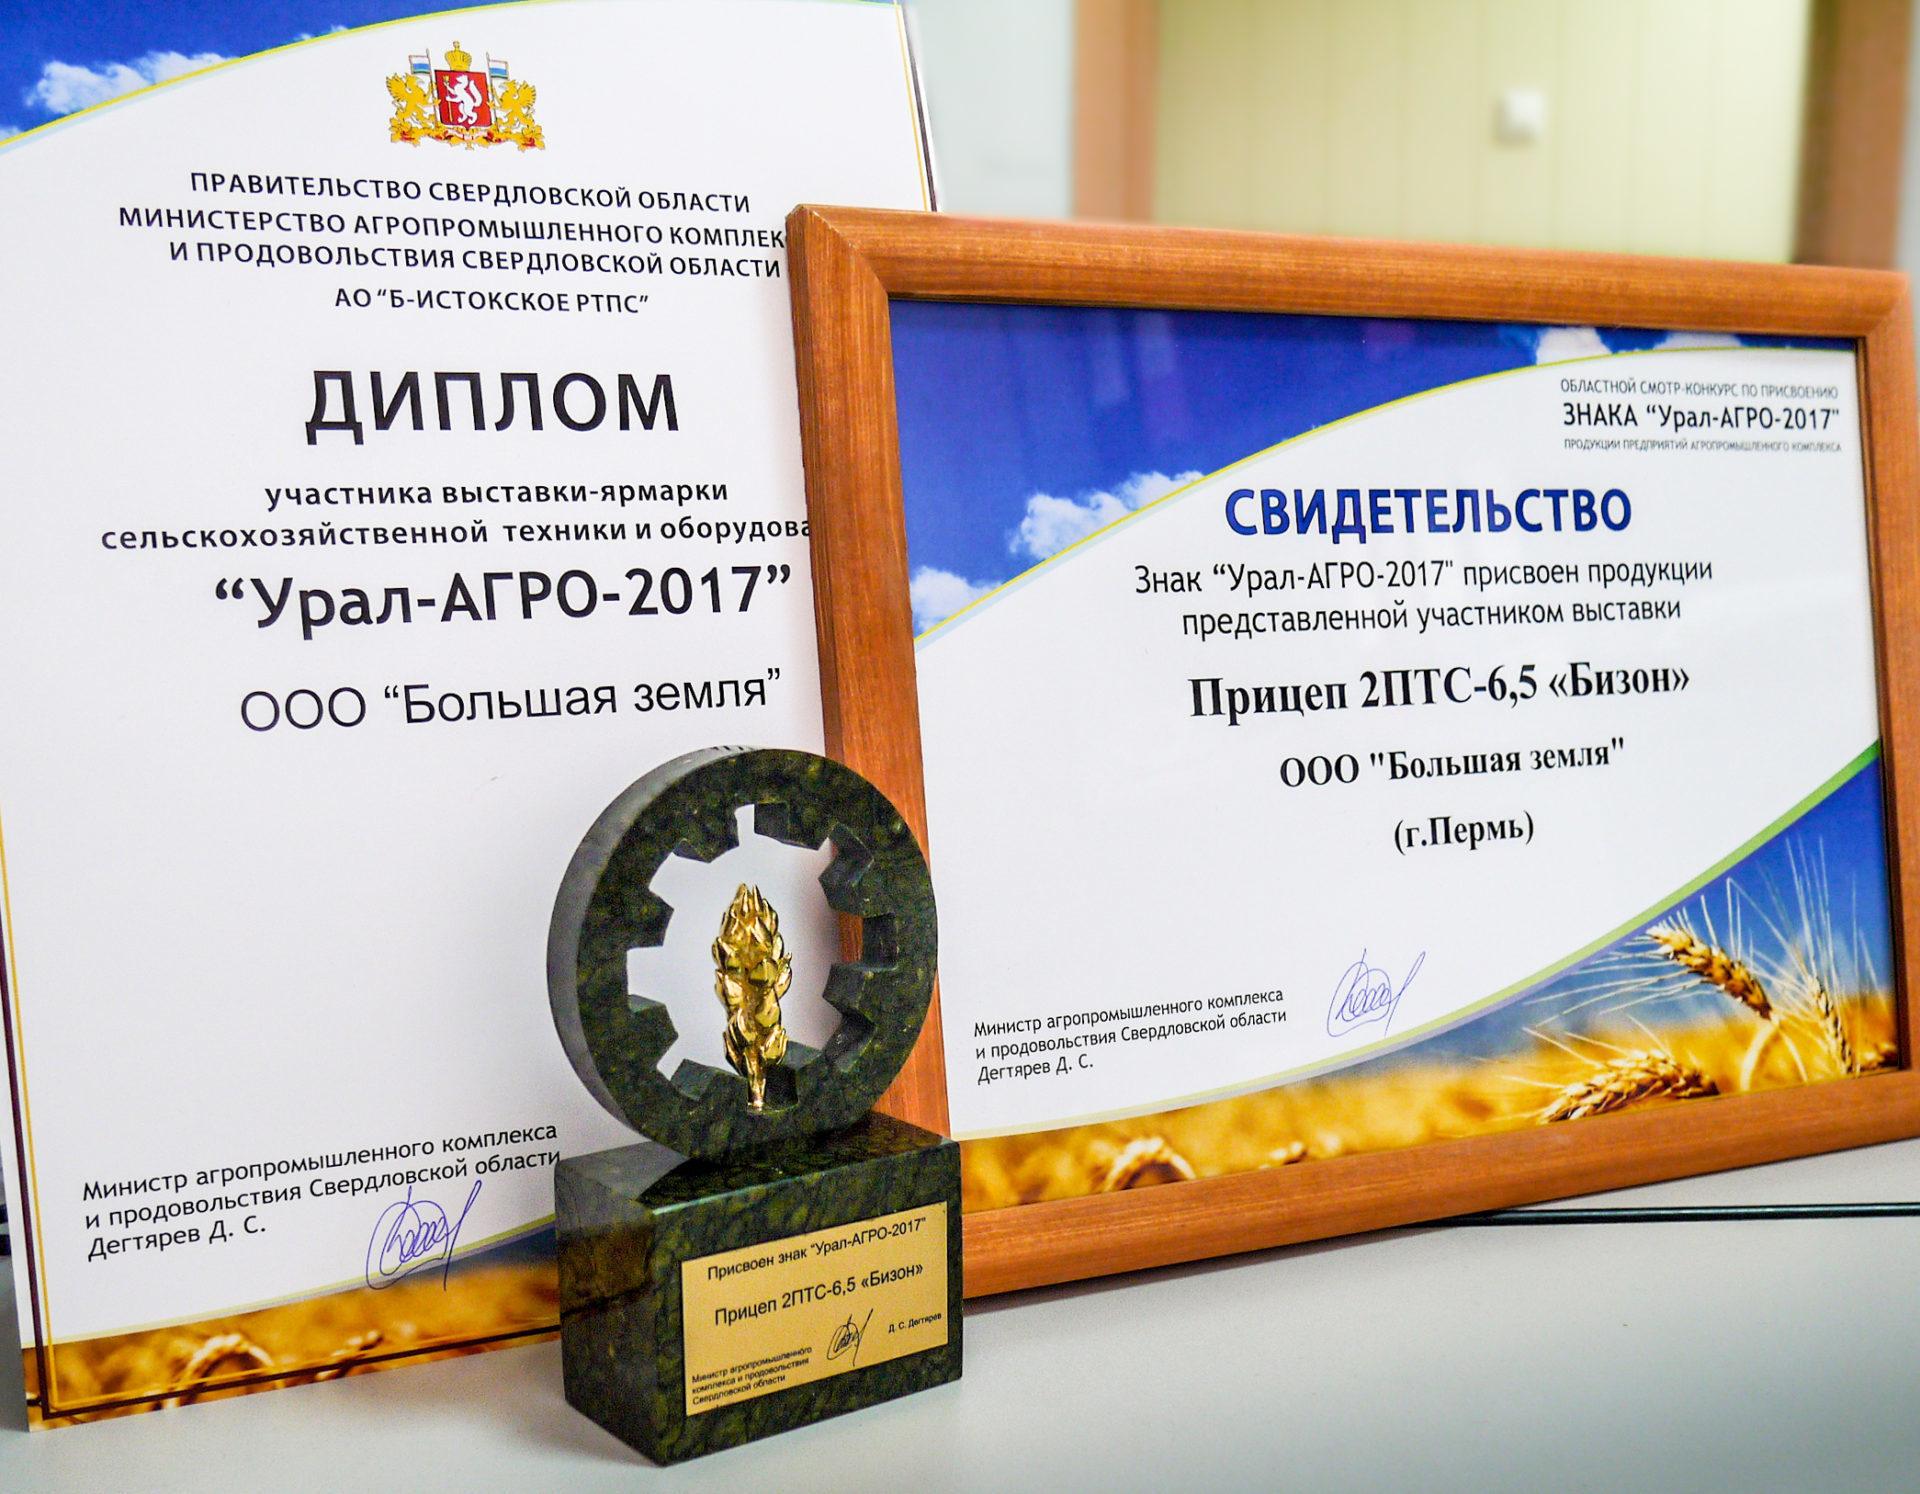 Прицеп Бизон 2птс-6,5 был отмечен знаком «Урал-Агро-2017».